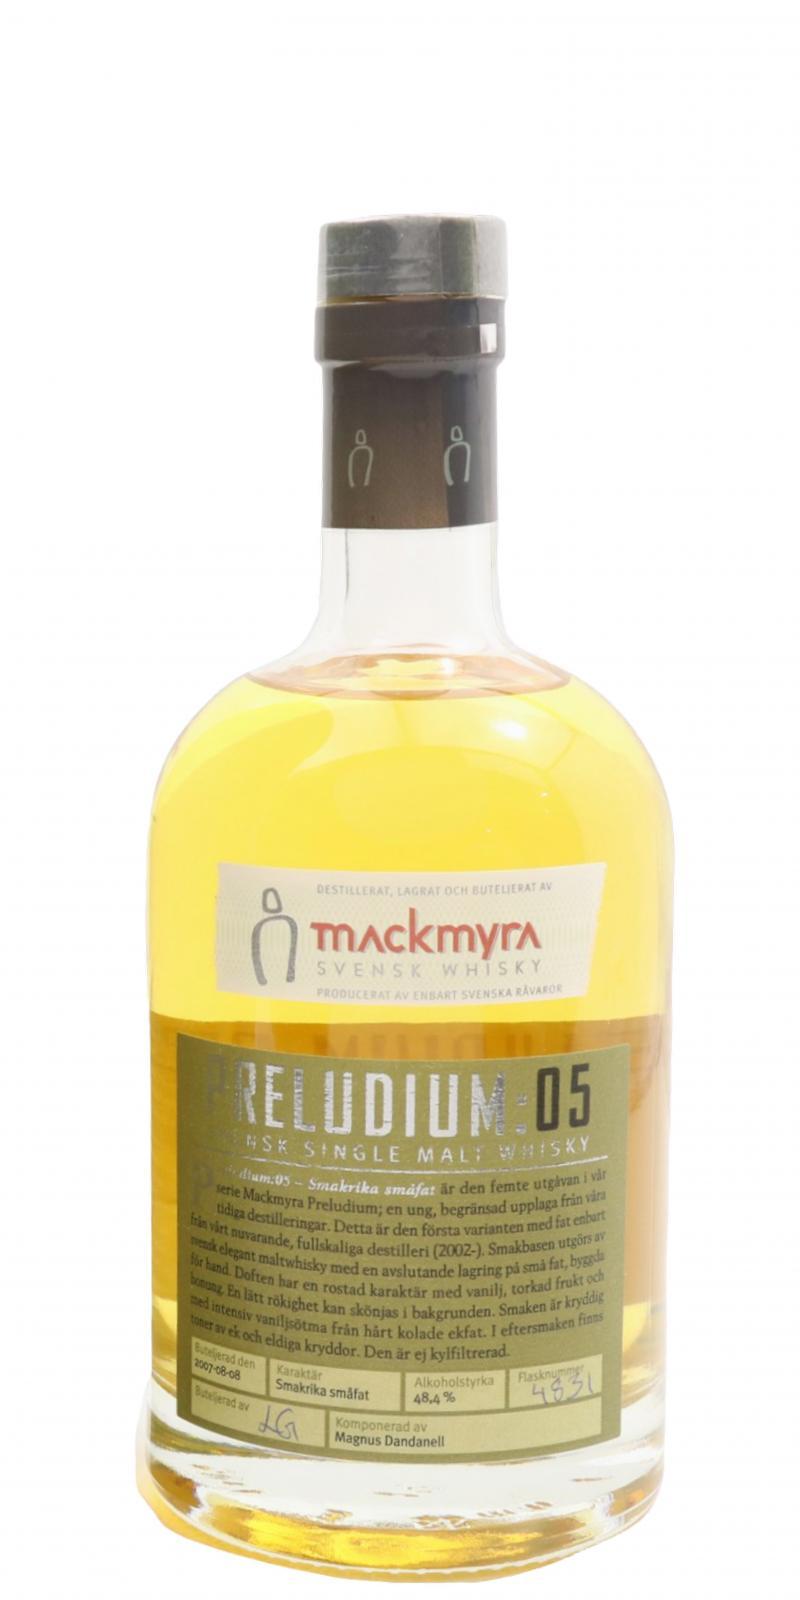 Mackmyra Preludium: 05